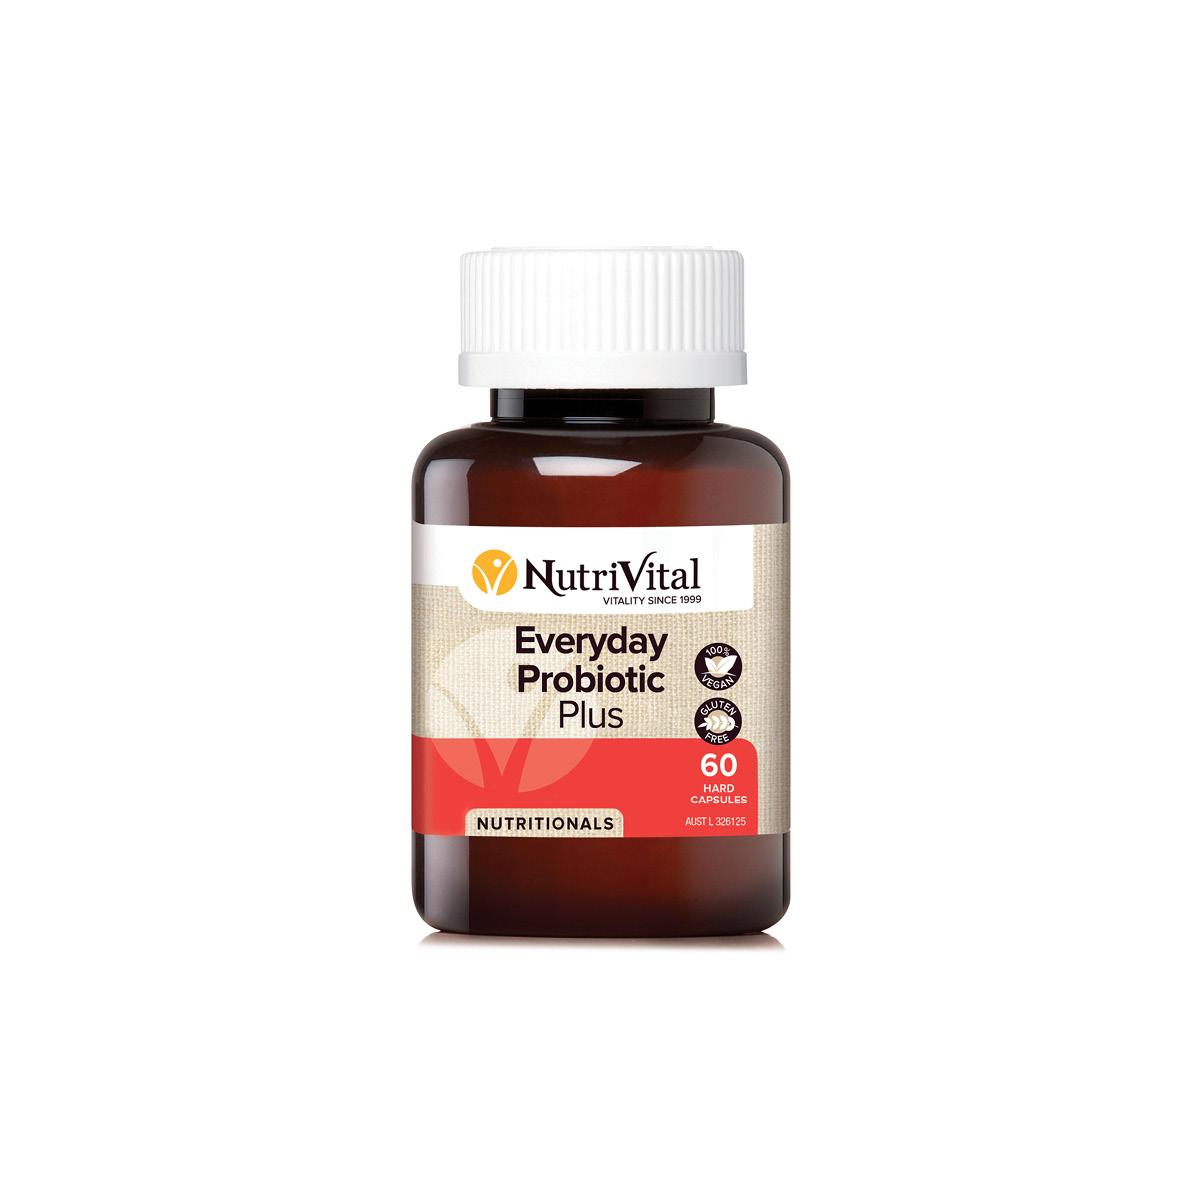 Nutrivital Everyday Probiotic Plus